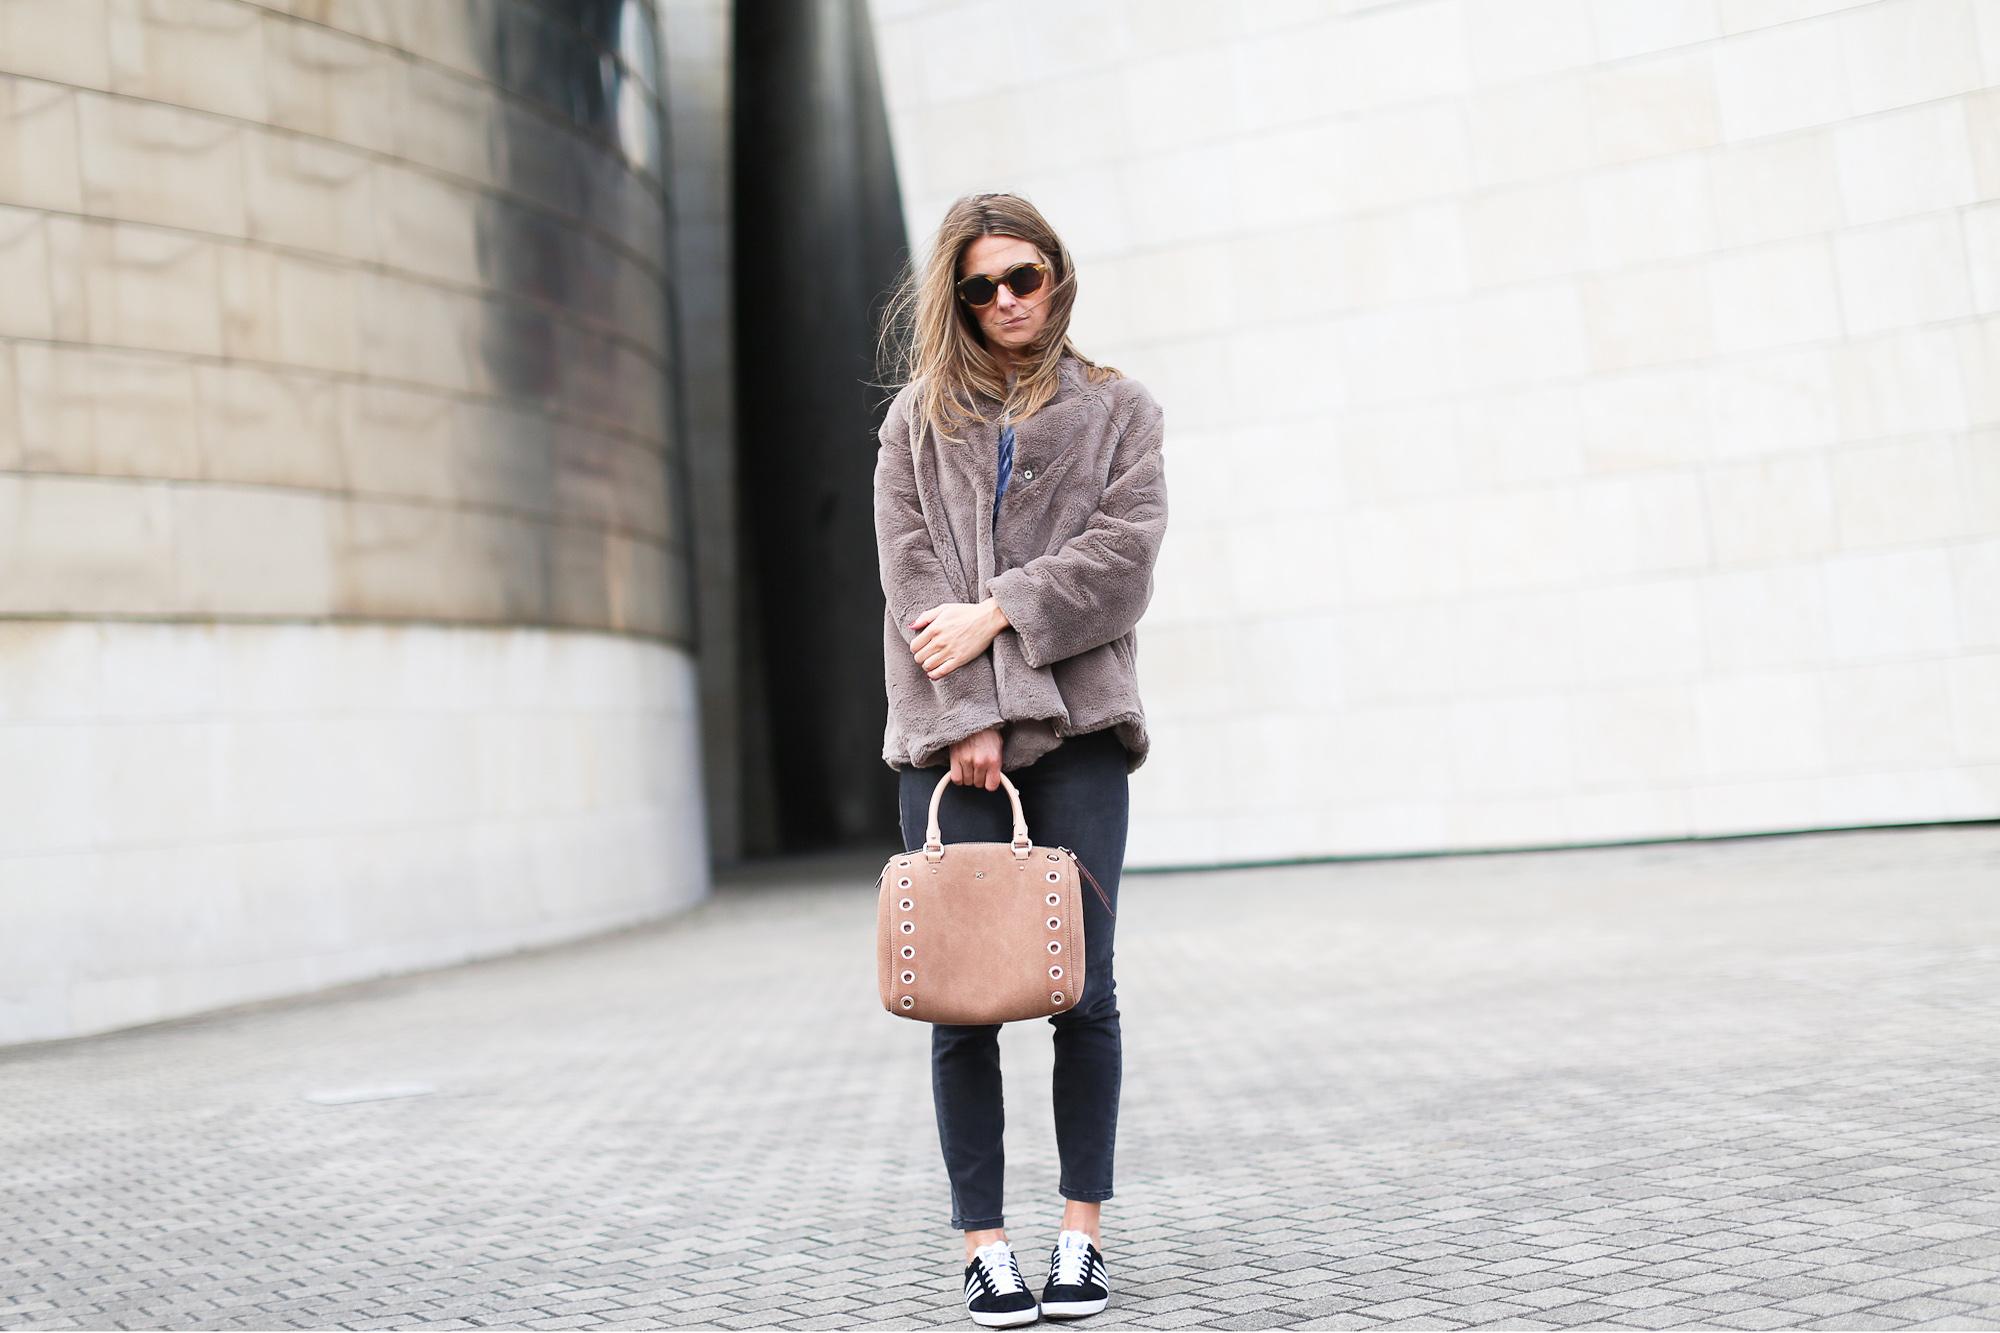 Clochet_streetstyle_fashionblogger_bilbao_guggenheim_purificaciongarcia_bolsoante_adidasgazelle-3